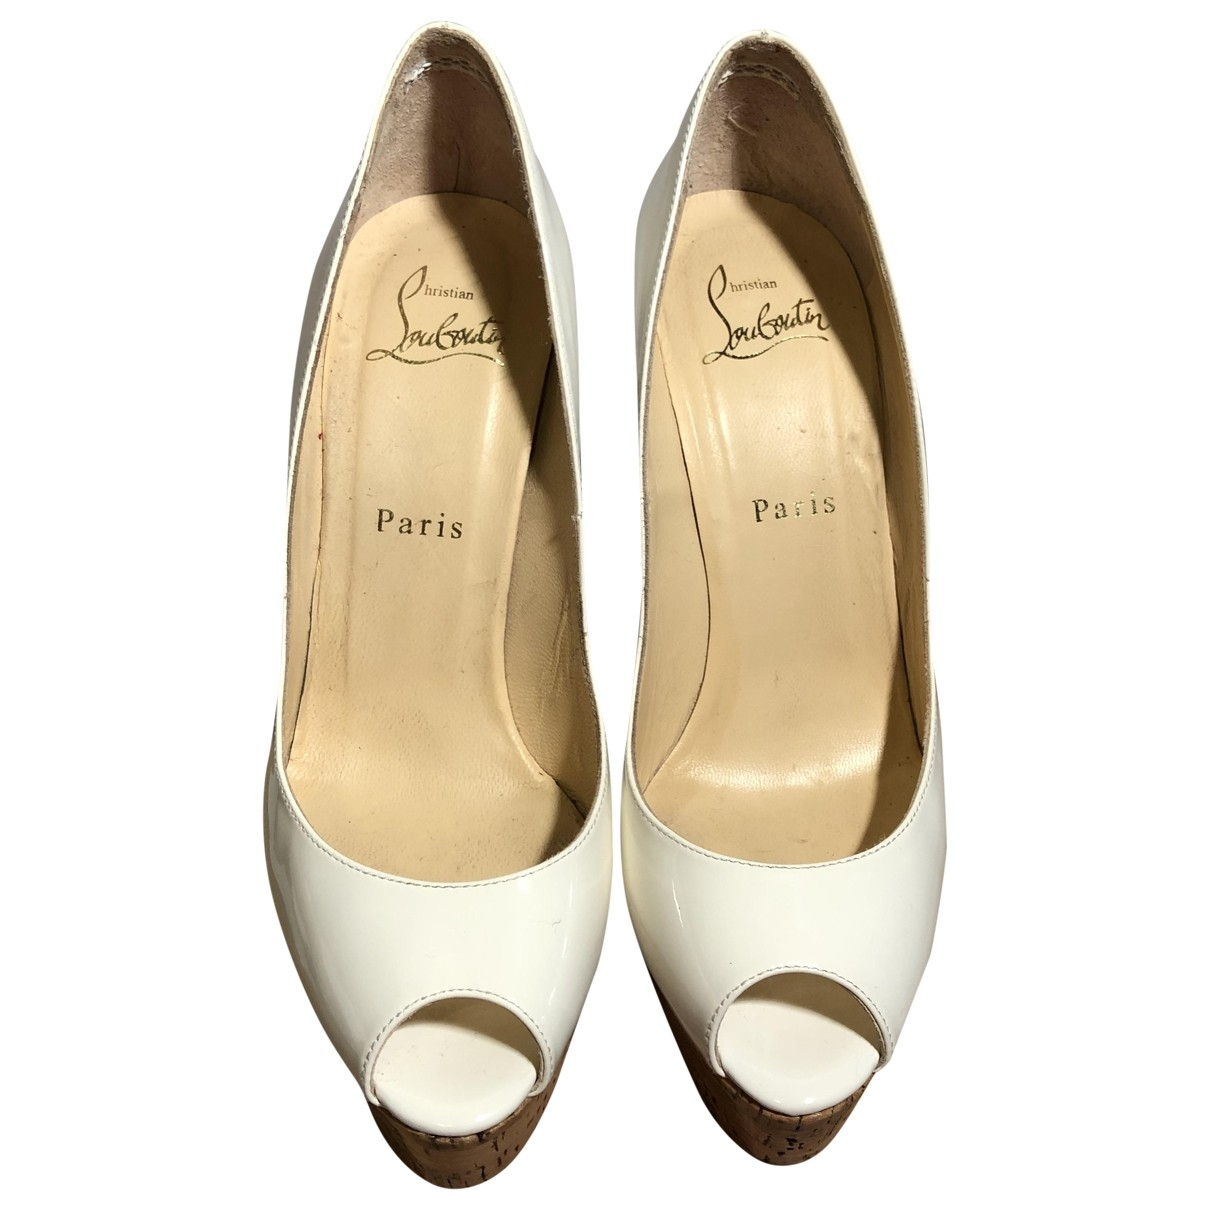 Christian Louboutin \N White Patent leather Heels for Women 37.5 EU